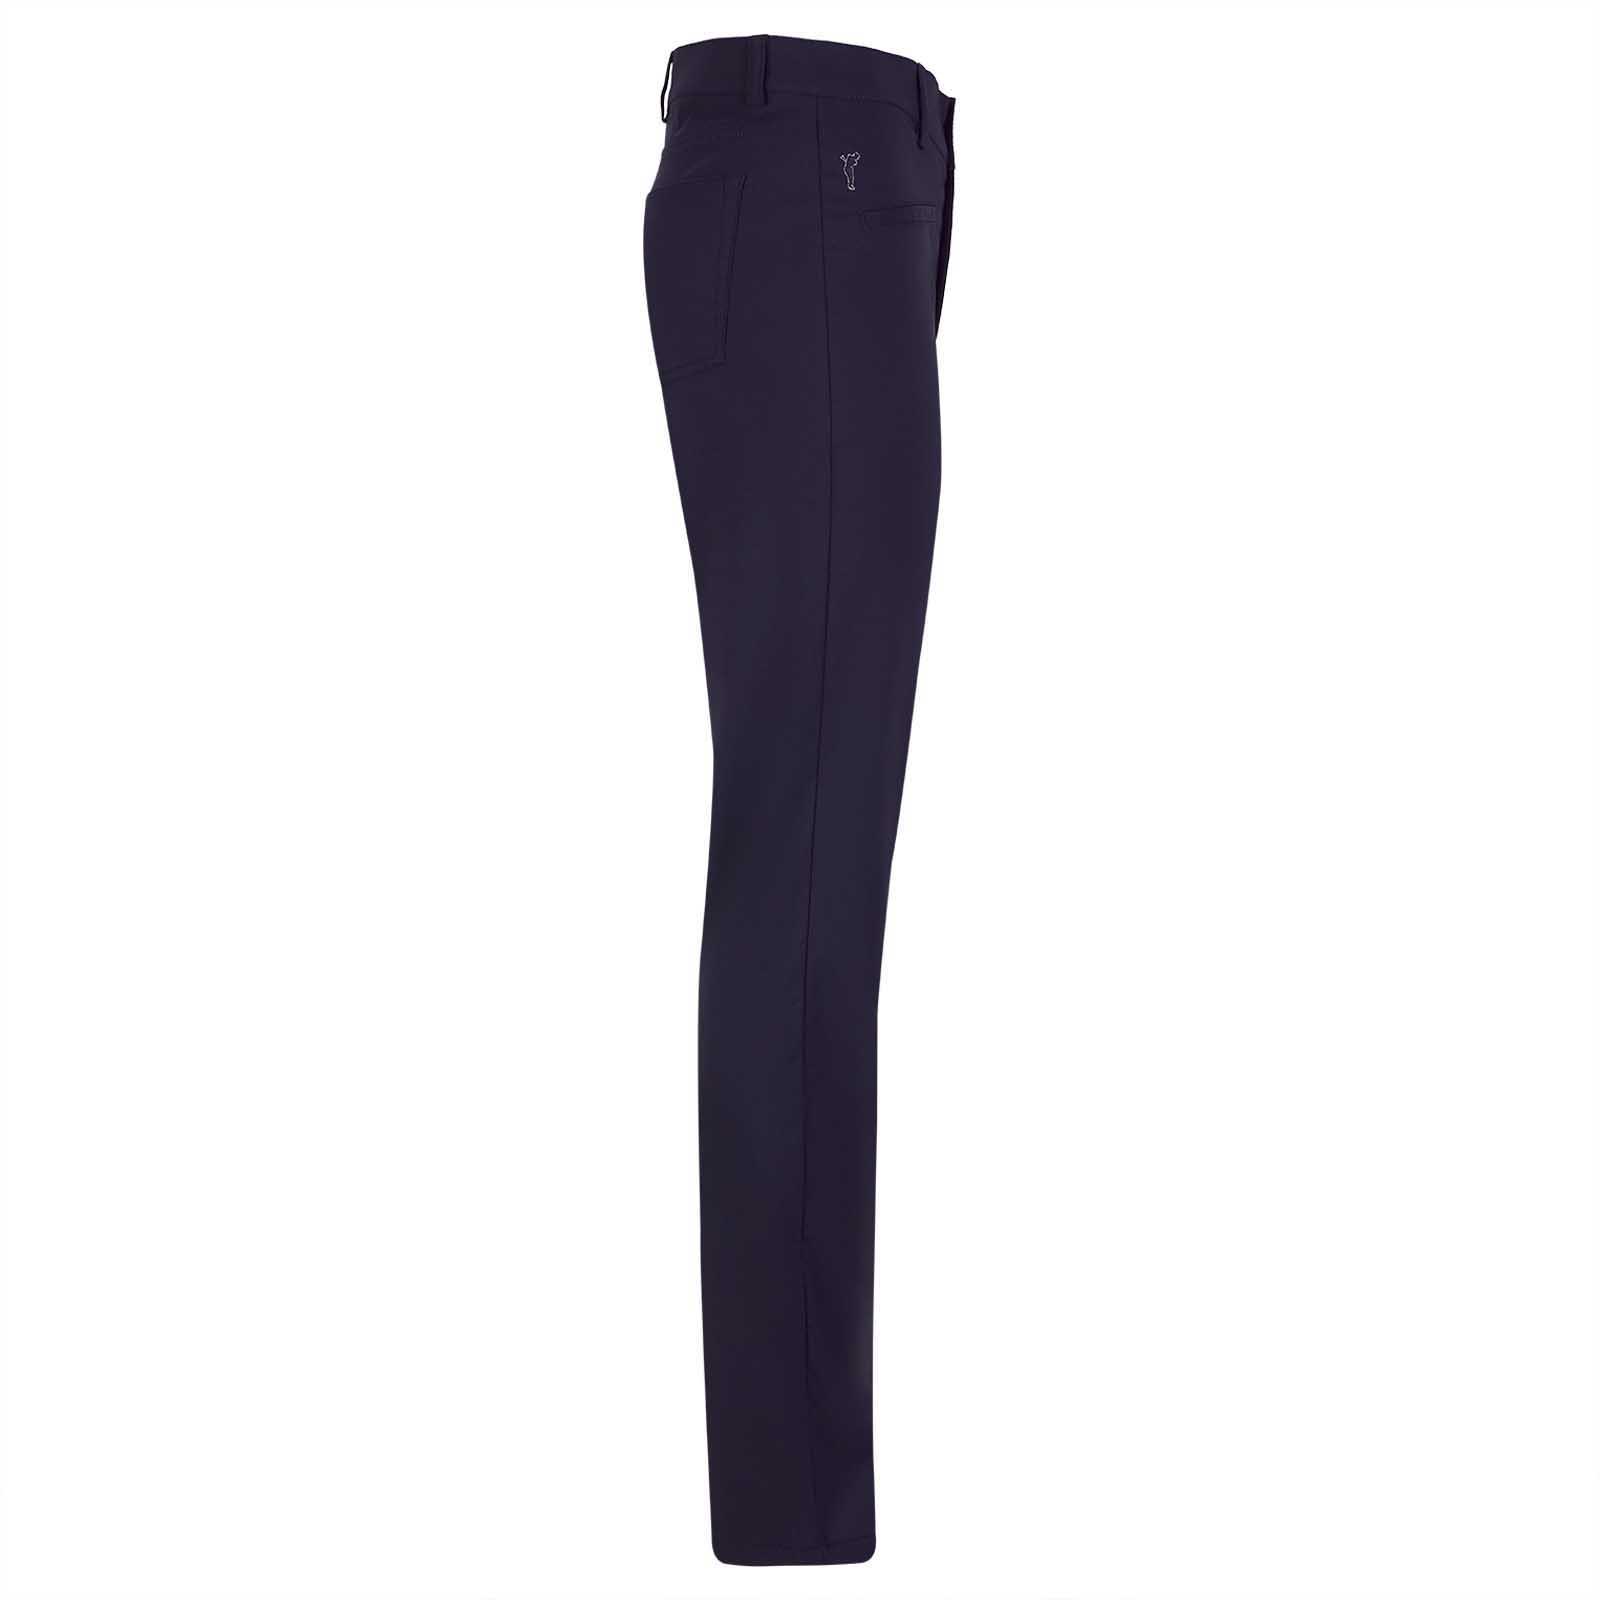 Damen Techno-Stretch Golfhose lang aus exklusivem Funktionsmaterial